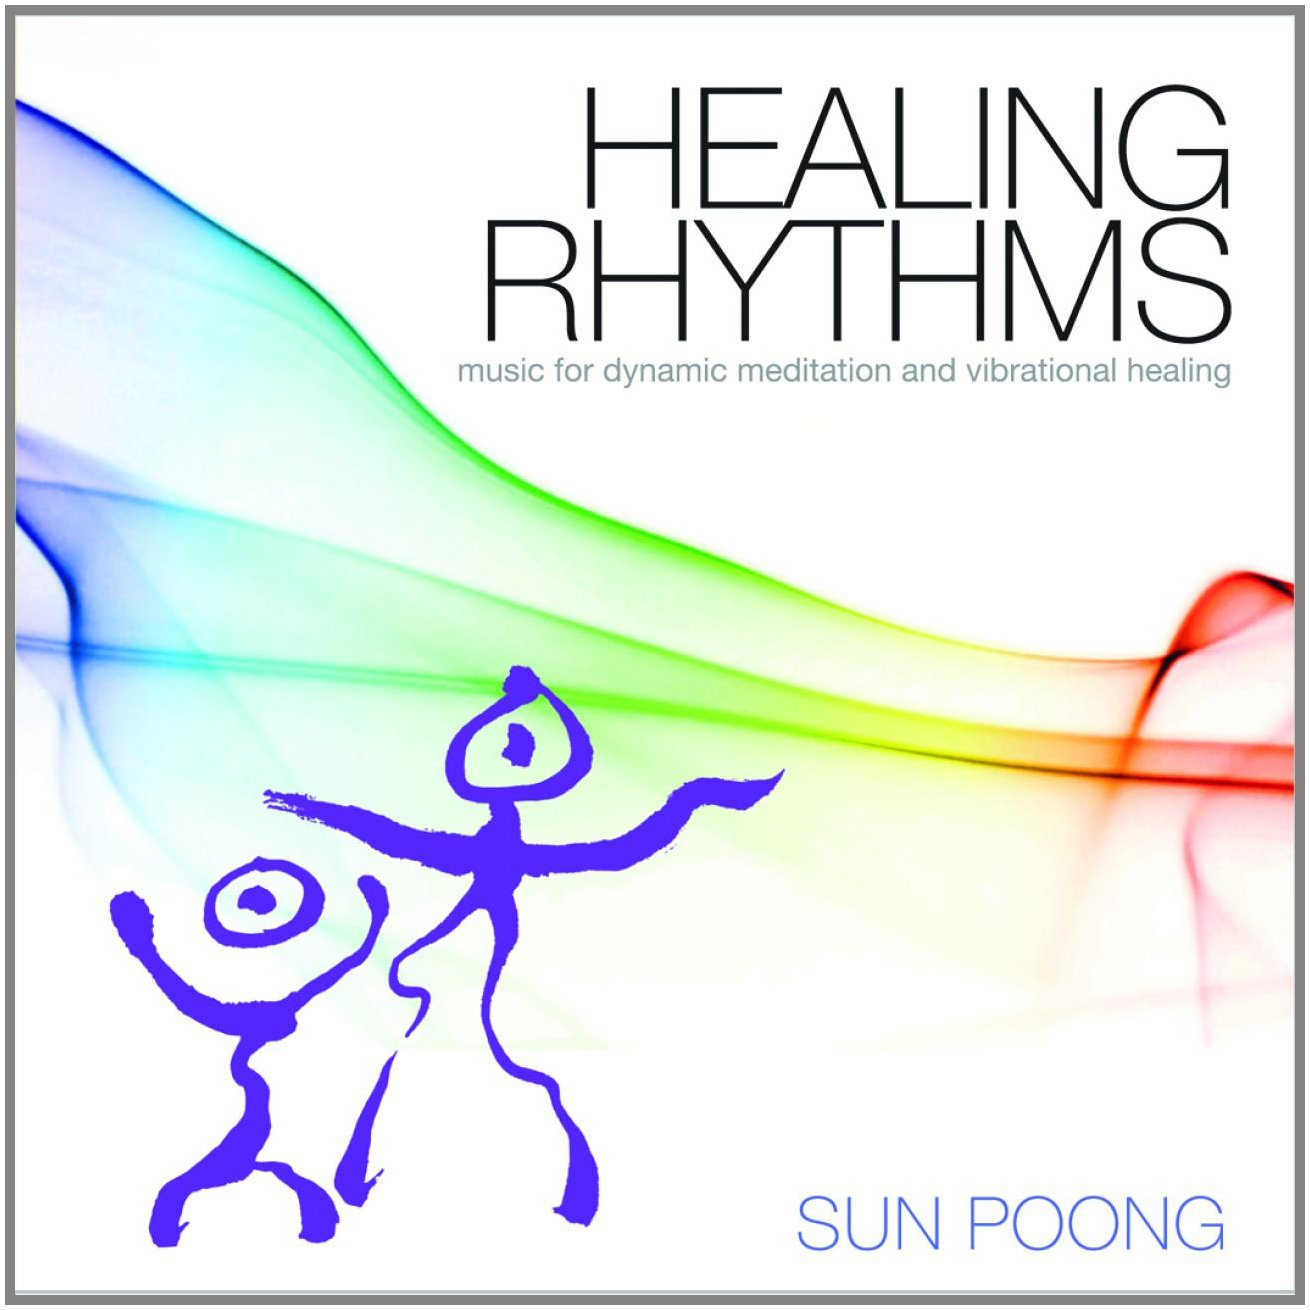 Healing Rhythms: Music for Dynamic Meditation and Vibrational Healing